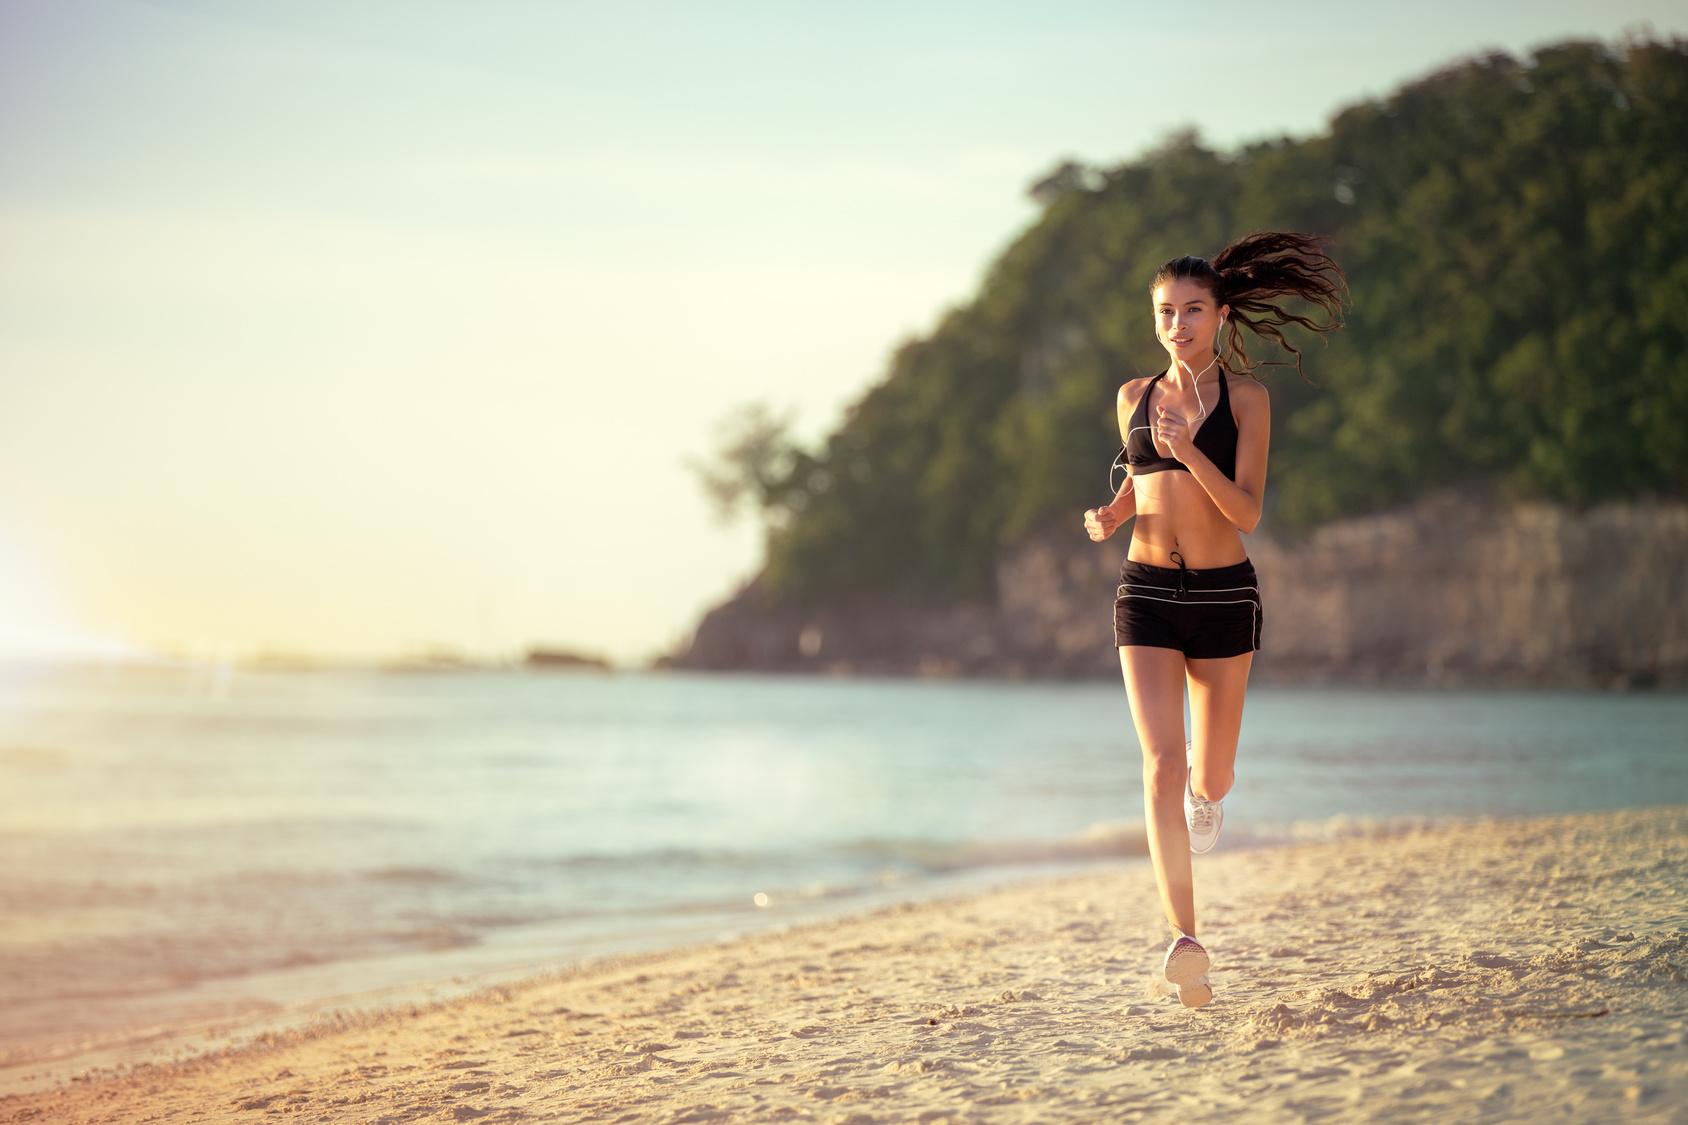 M corriendo playa